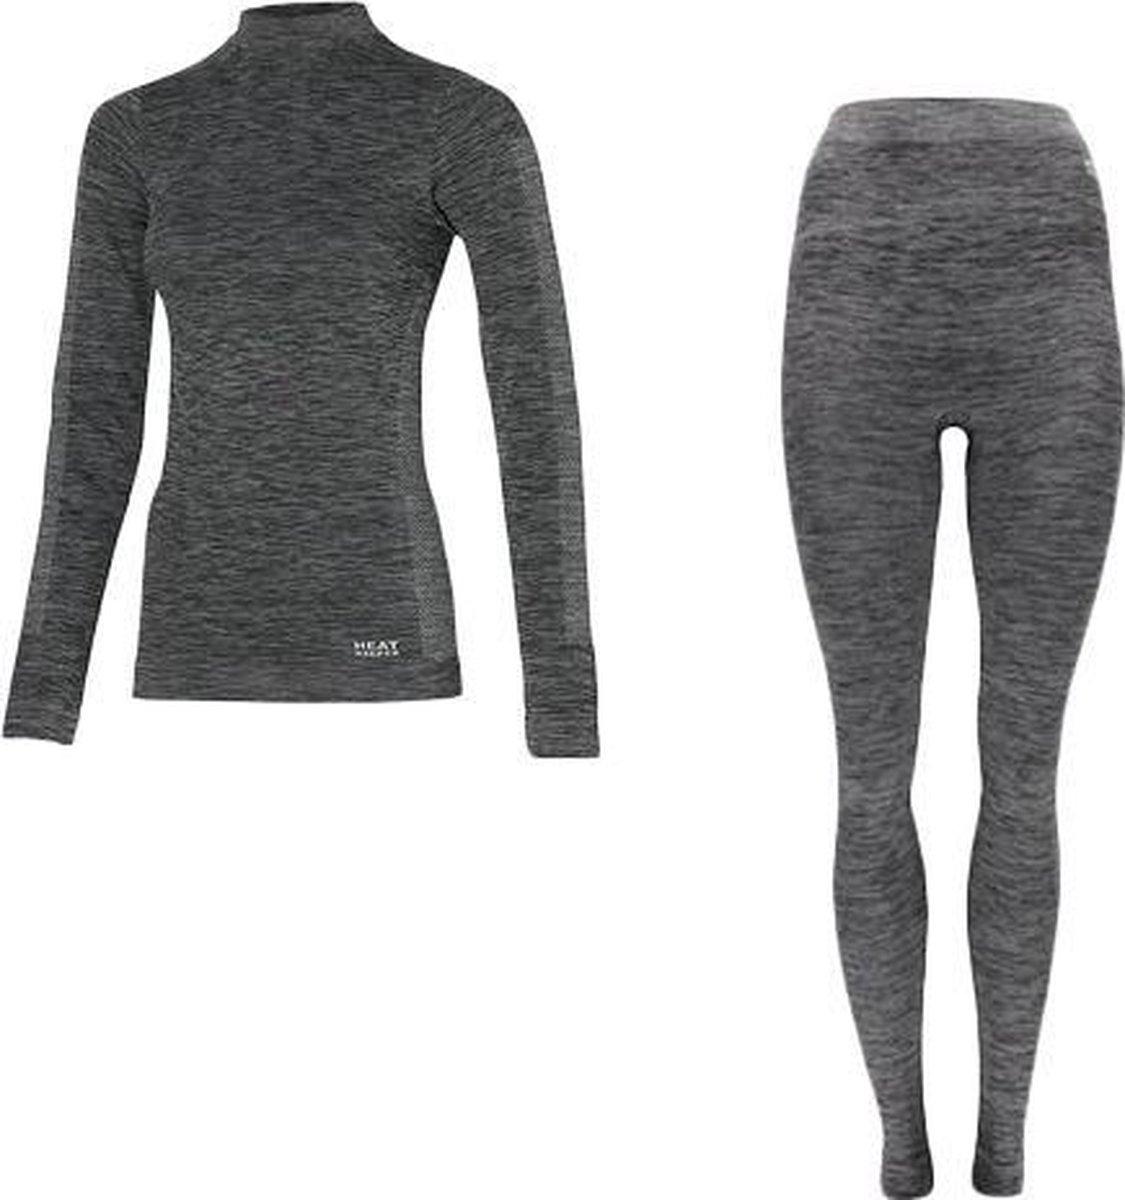 Premium thermokleding - Type: Dames, maat L - Broek en shirt - Thermoset